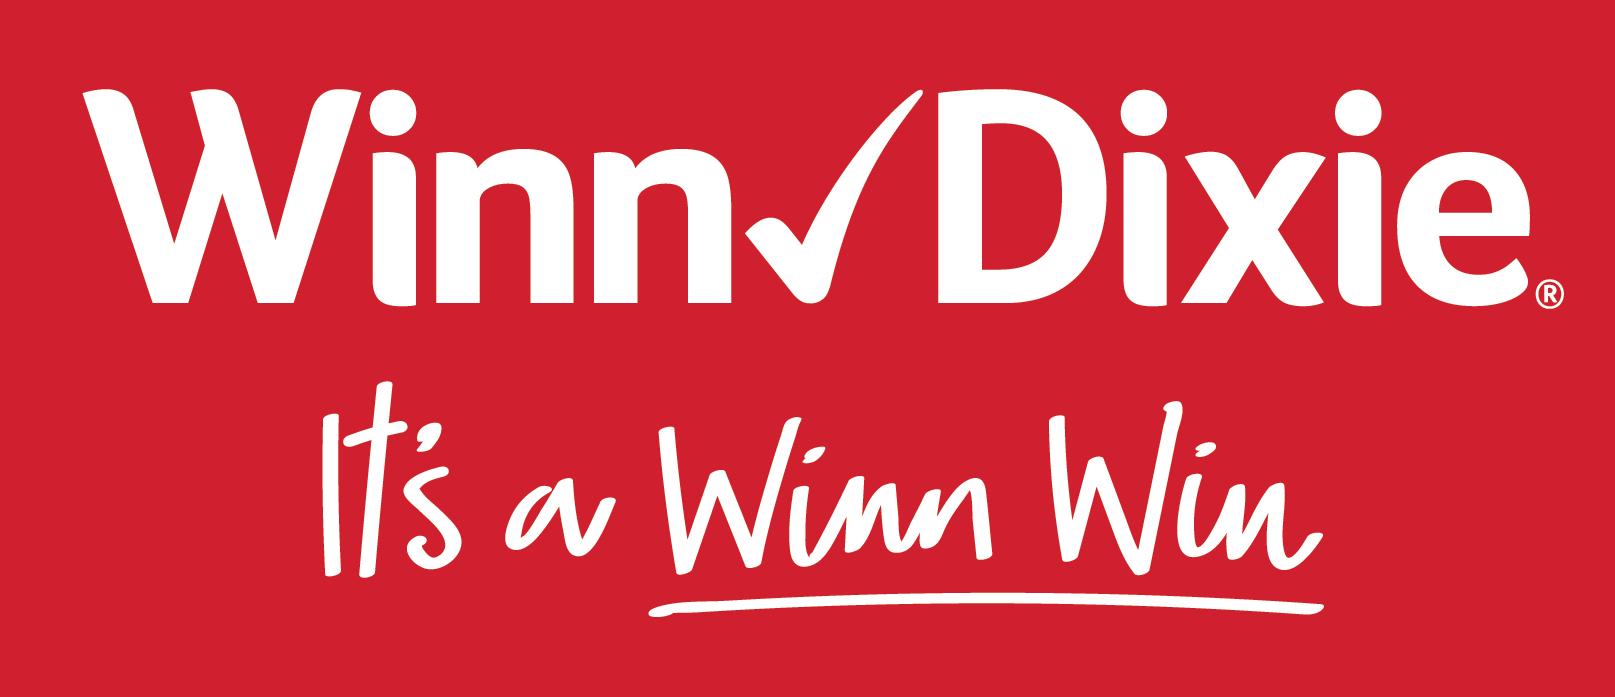 Get YOUR WINN ON!